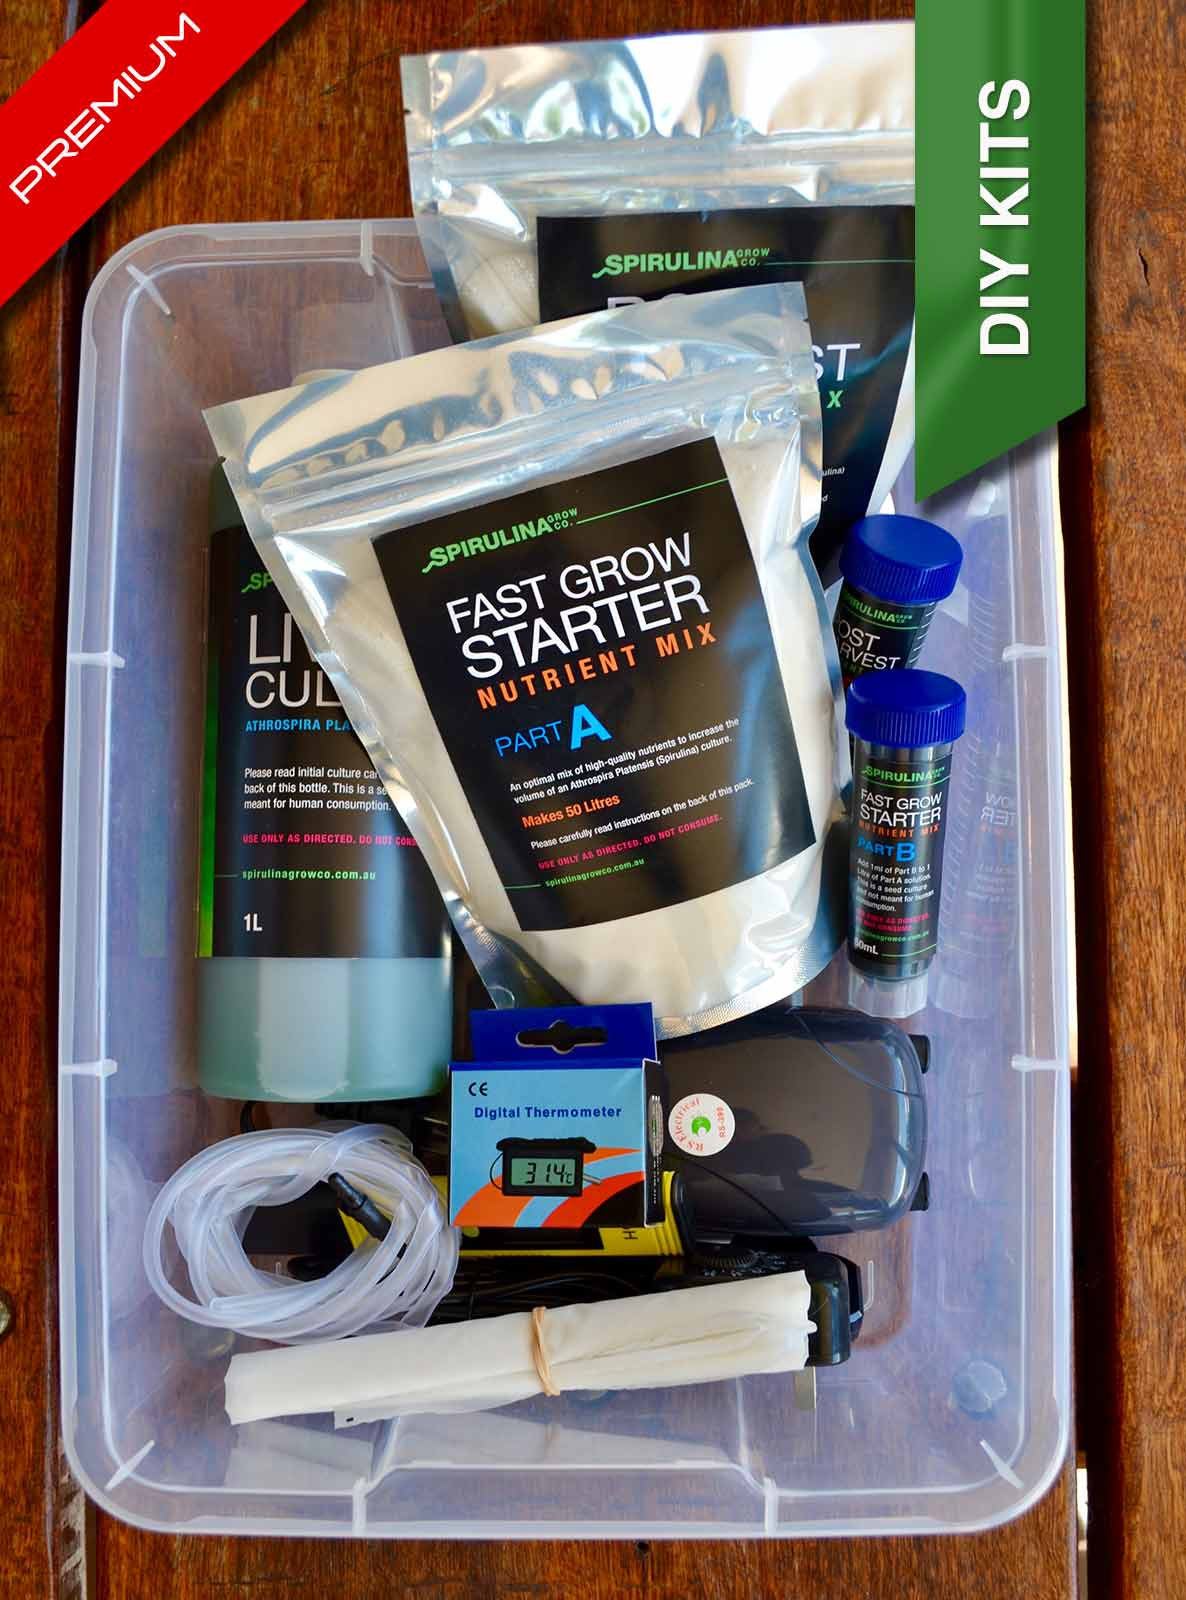 Premium DIY Spirulina micro-farming Kit Australia